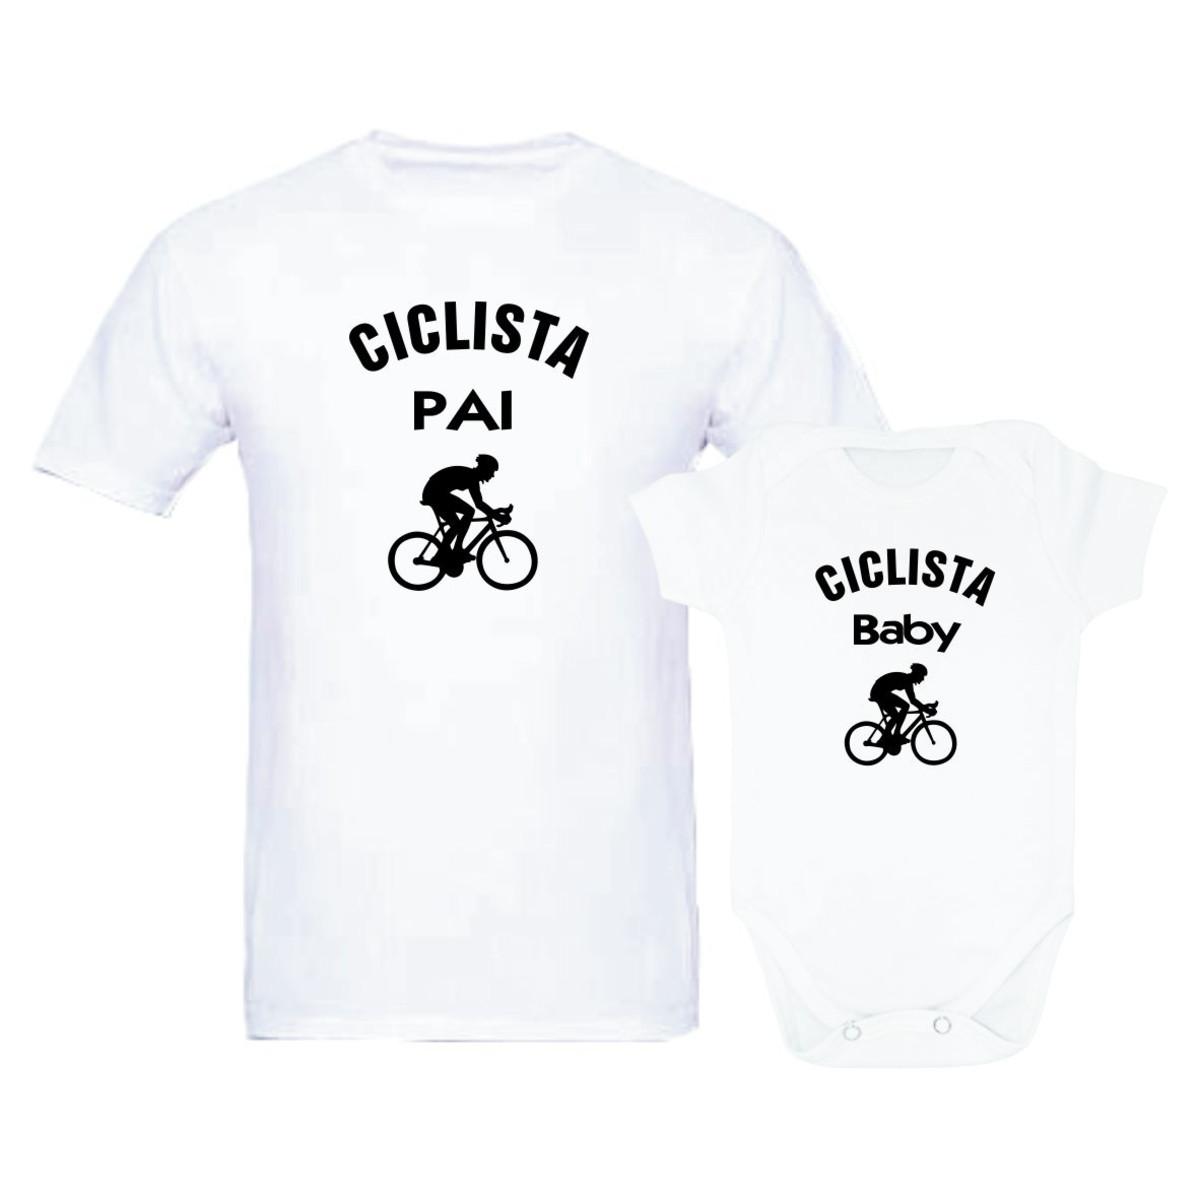 f29a0ea97 Kit Tal Pai Tal Filho Filha Ciclista Pai Baby Dia dos Pais no Elo7 ...